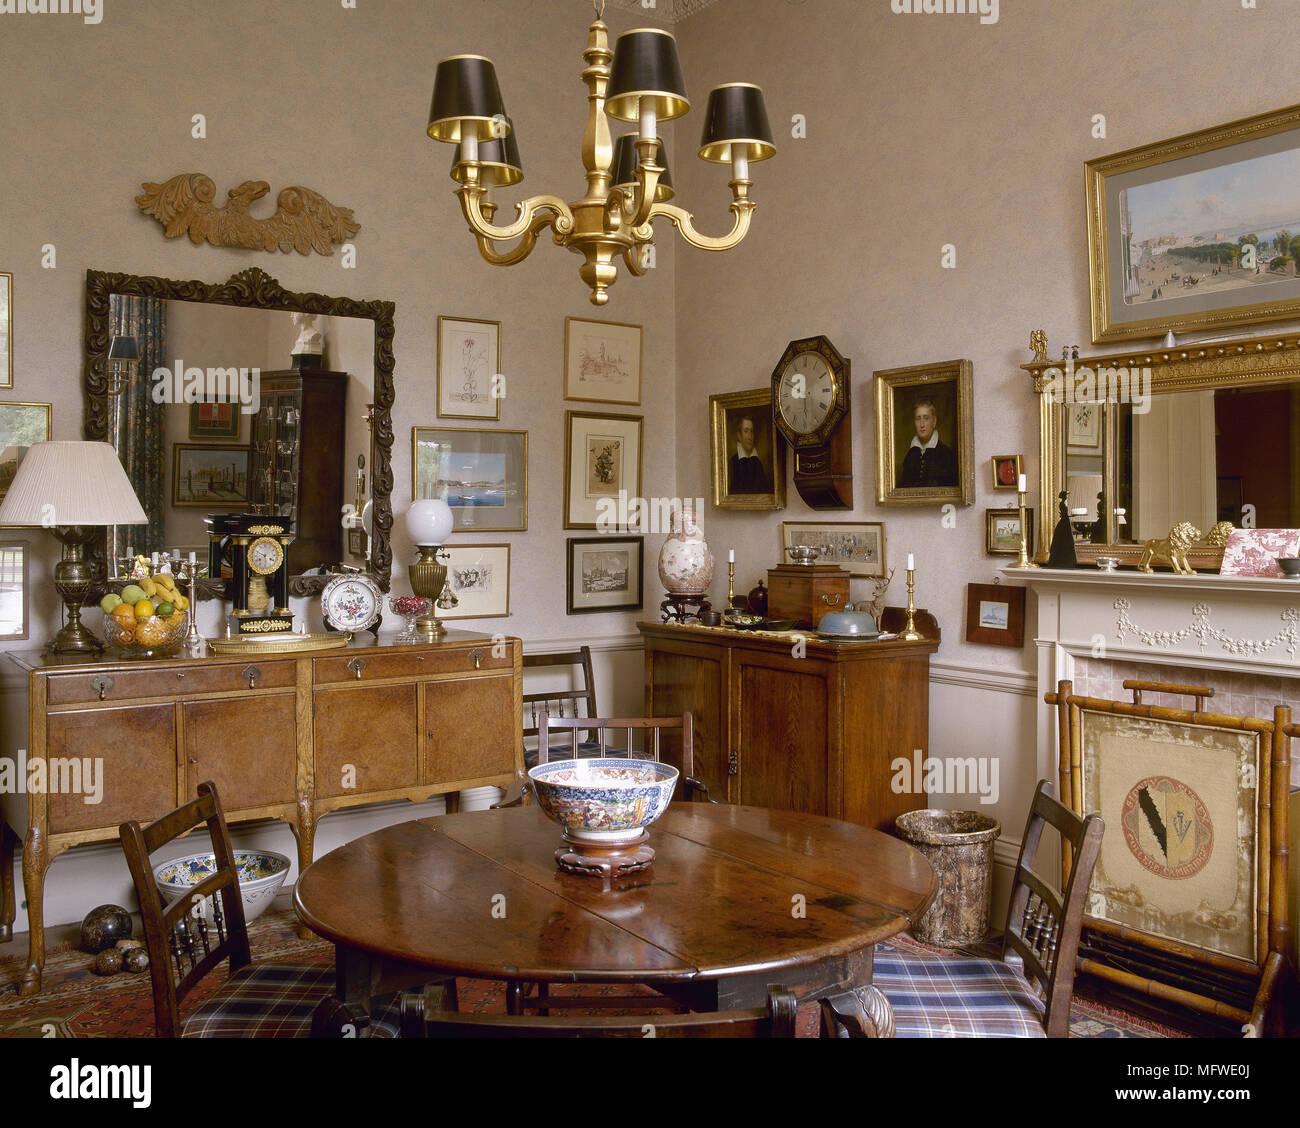 salle manger avec table ronde en bois et bahut lustre tableau ci dessus banque d 39 images. Black Bedroom Furniture Sets. Home Design Ideas